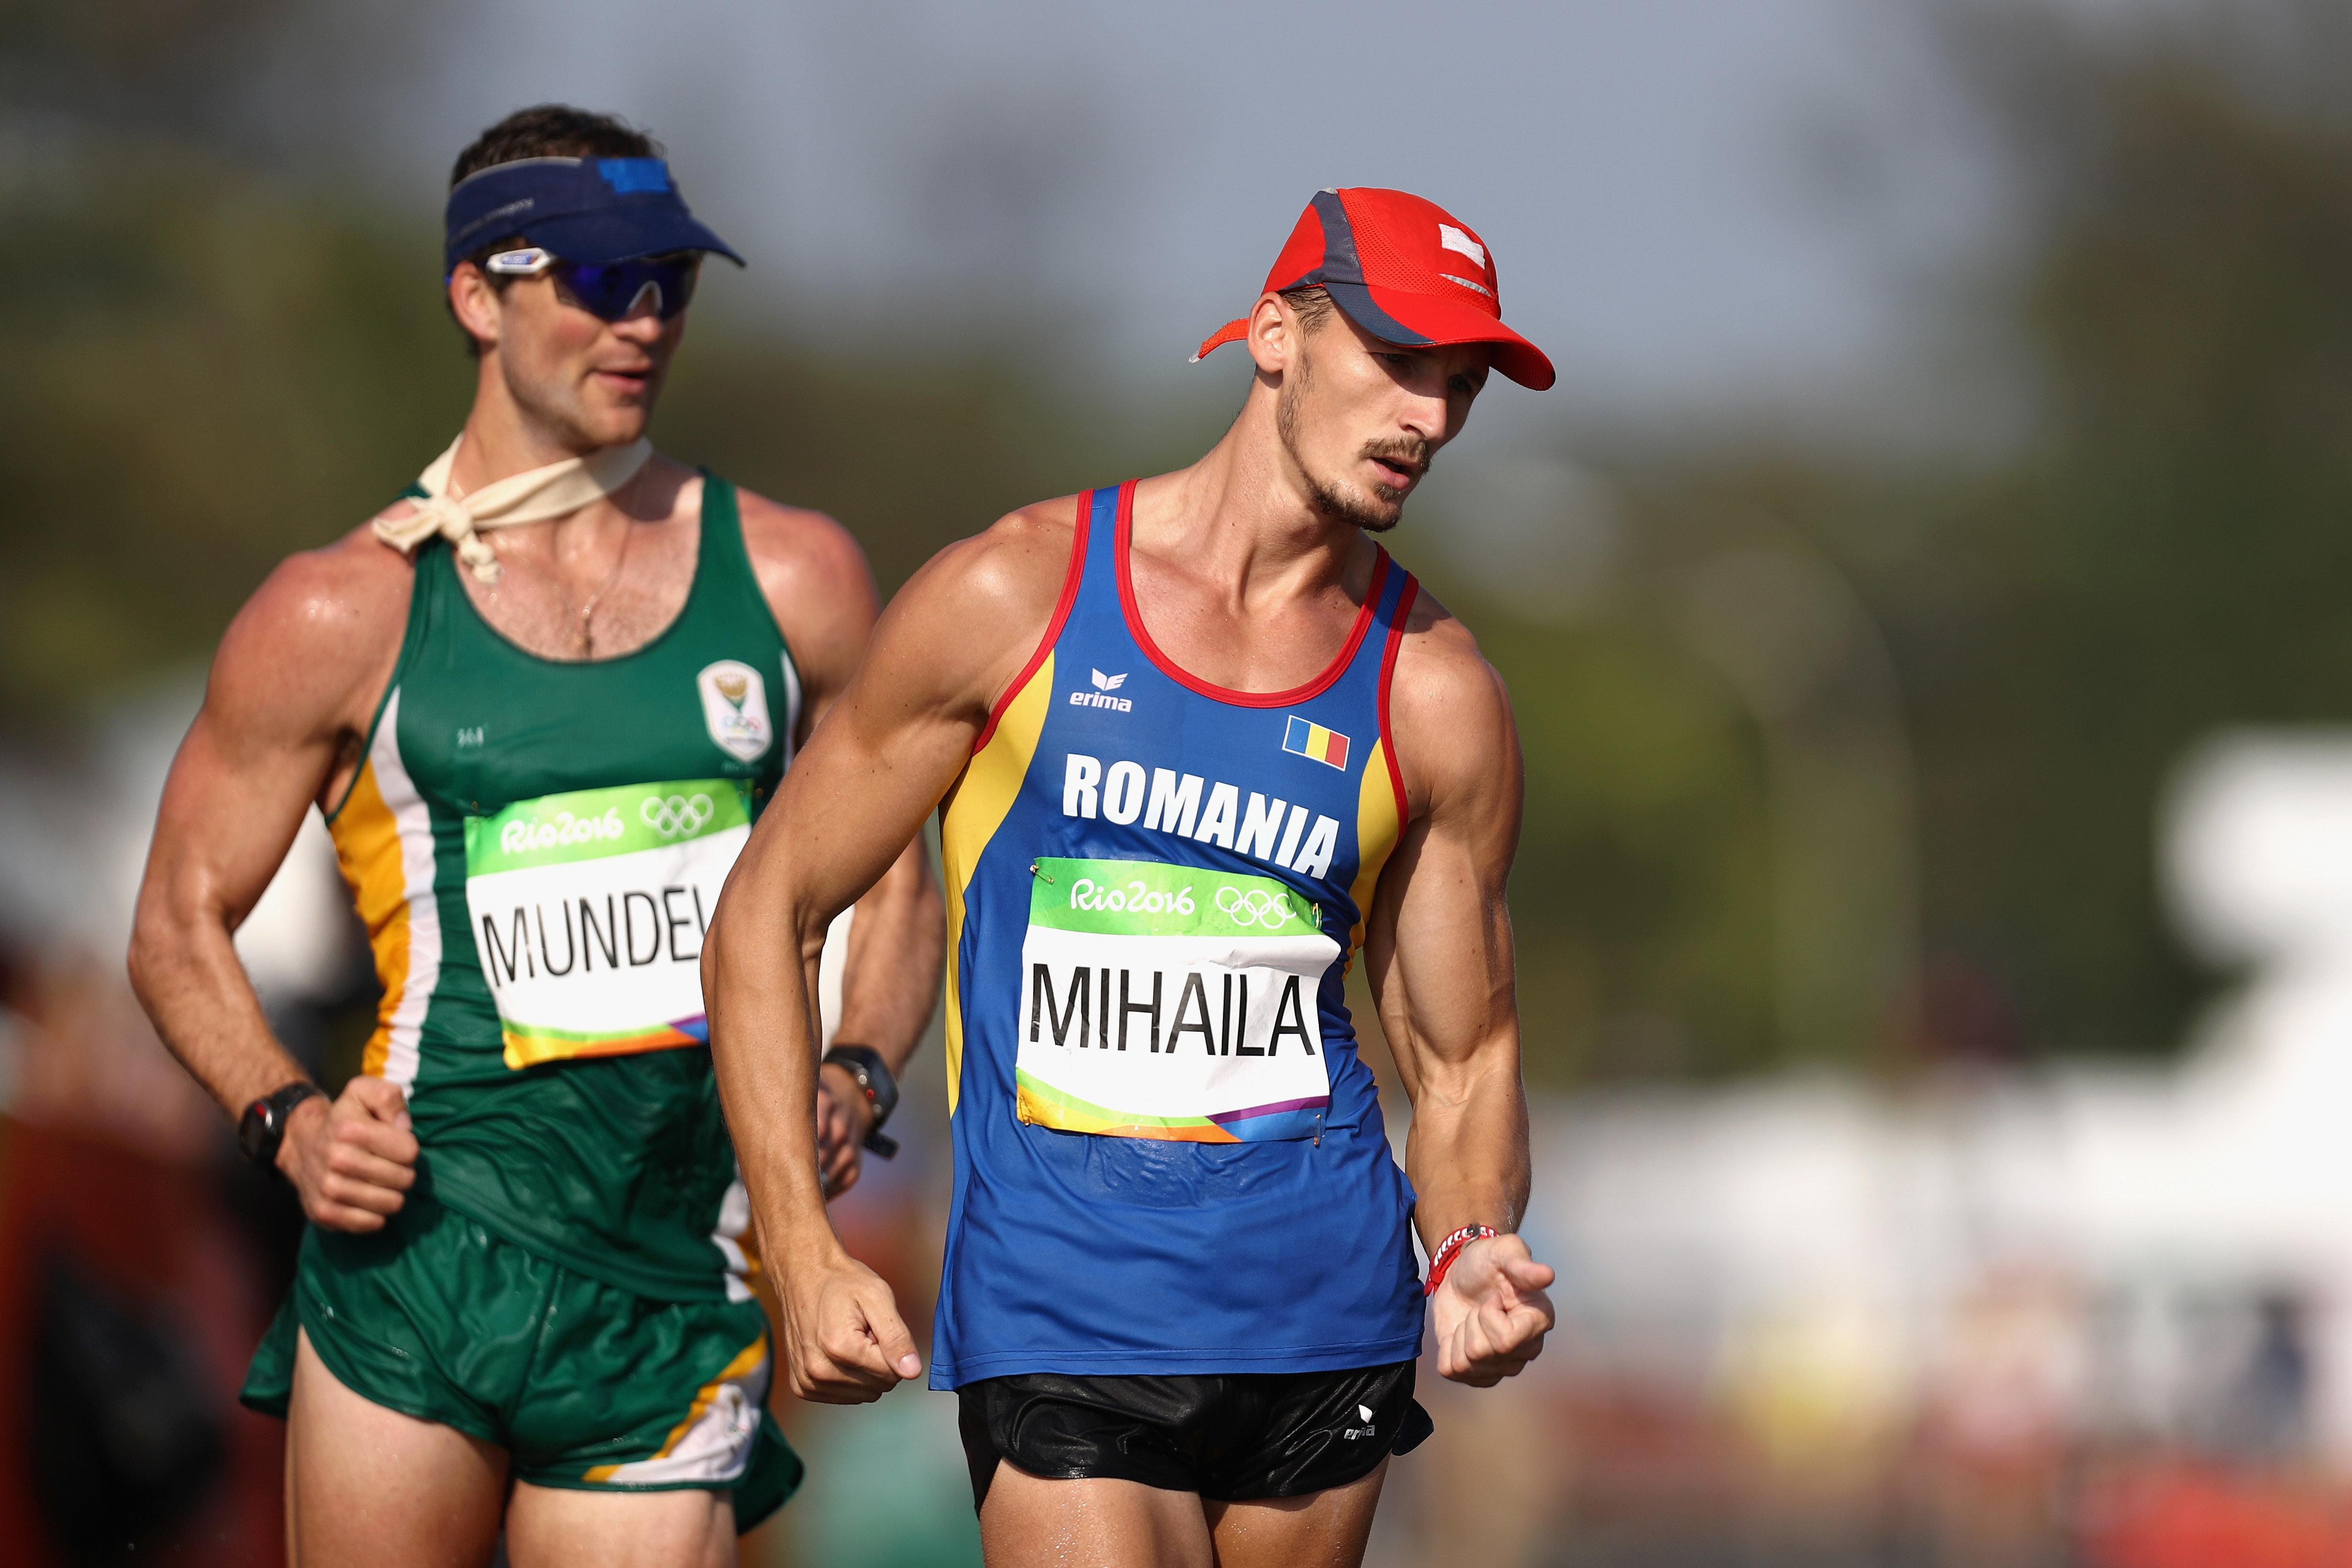 The men's 50km race walk was, um, run earlier on Friday.